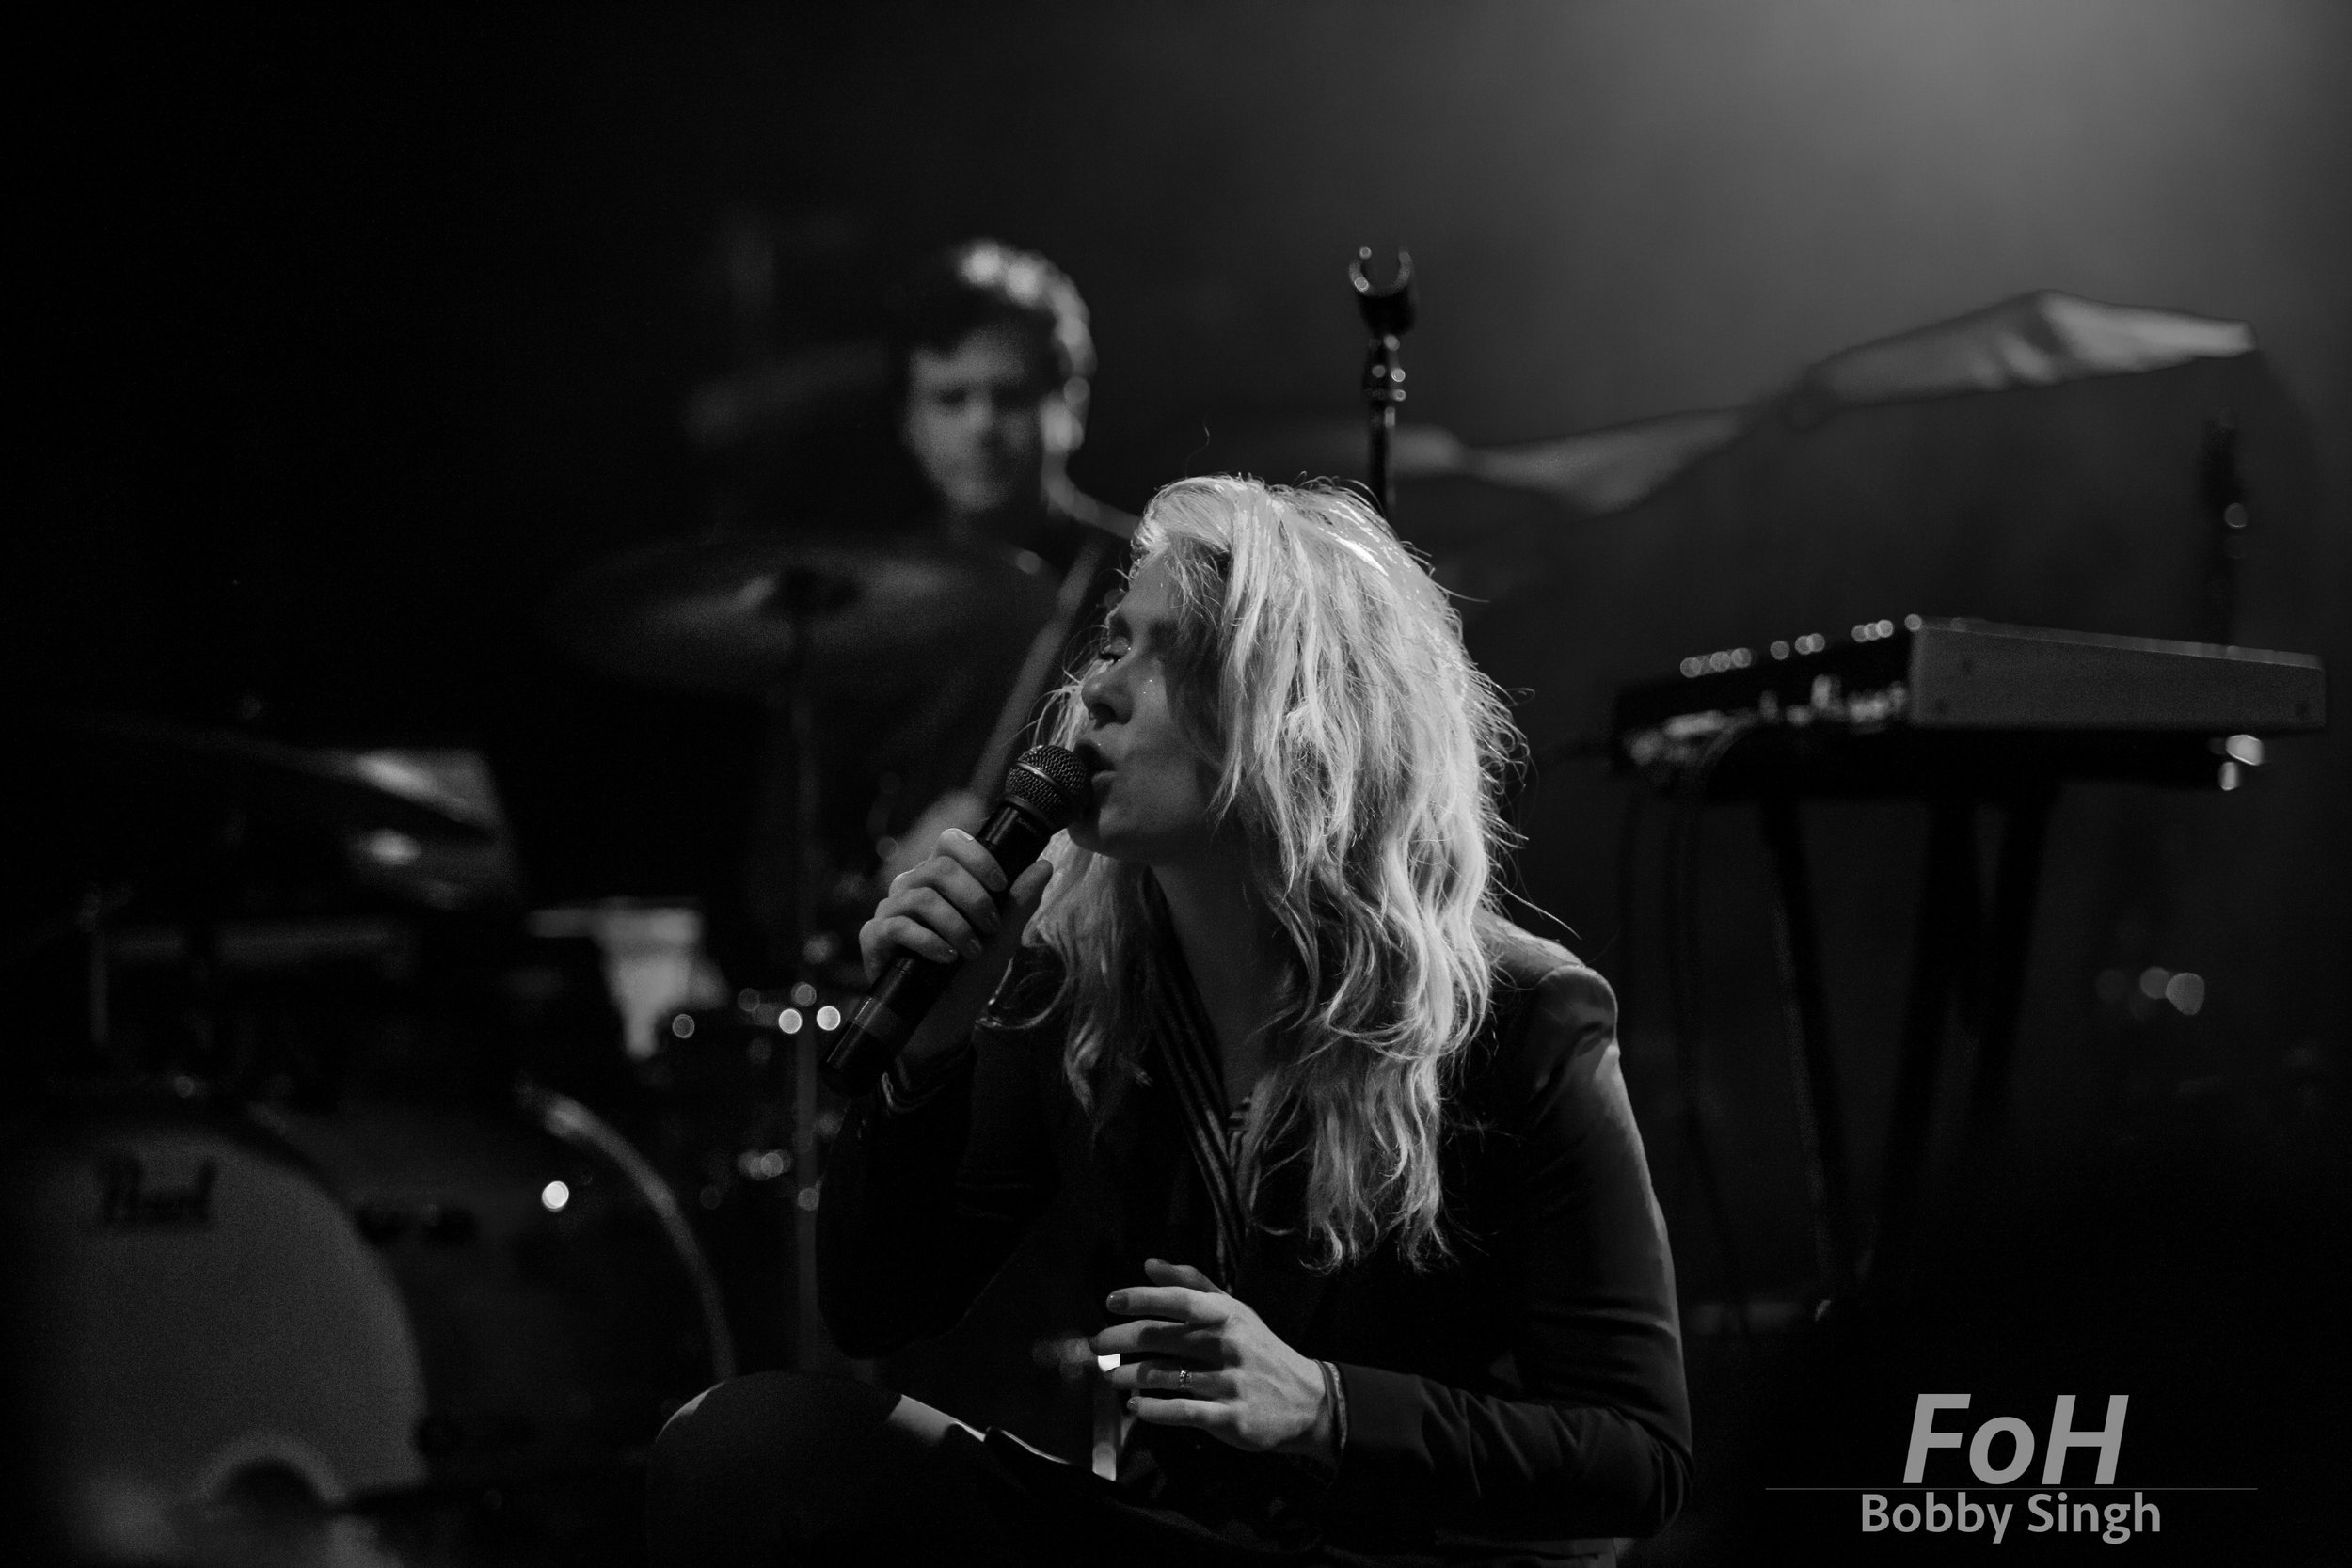 Ellevator. Danforth Music Hall. 10.18.2018. Bobby Singh/@fohphoto